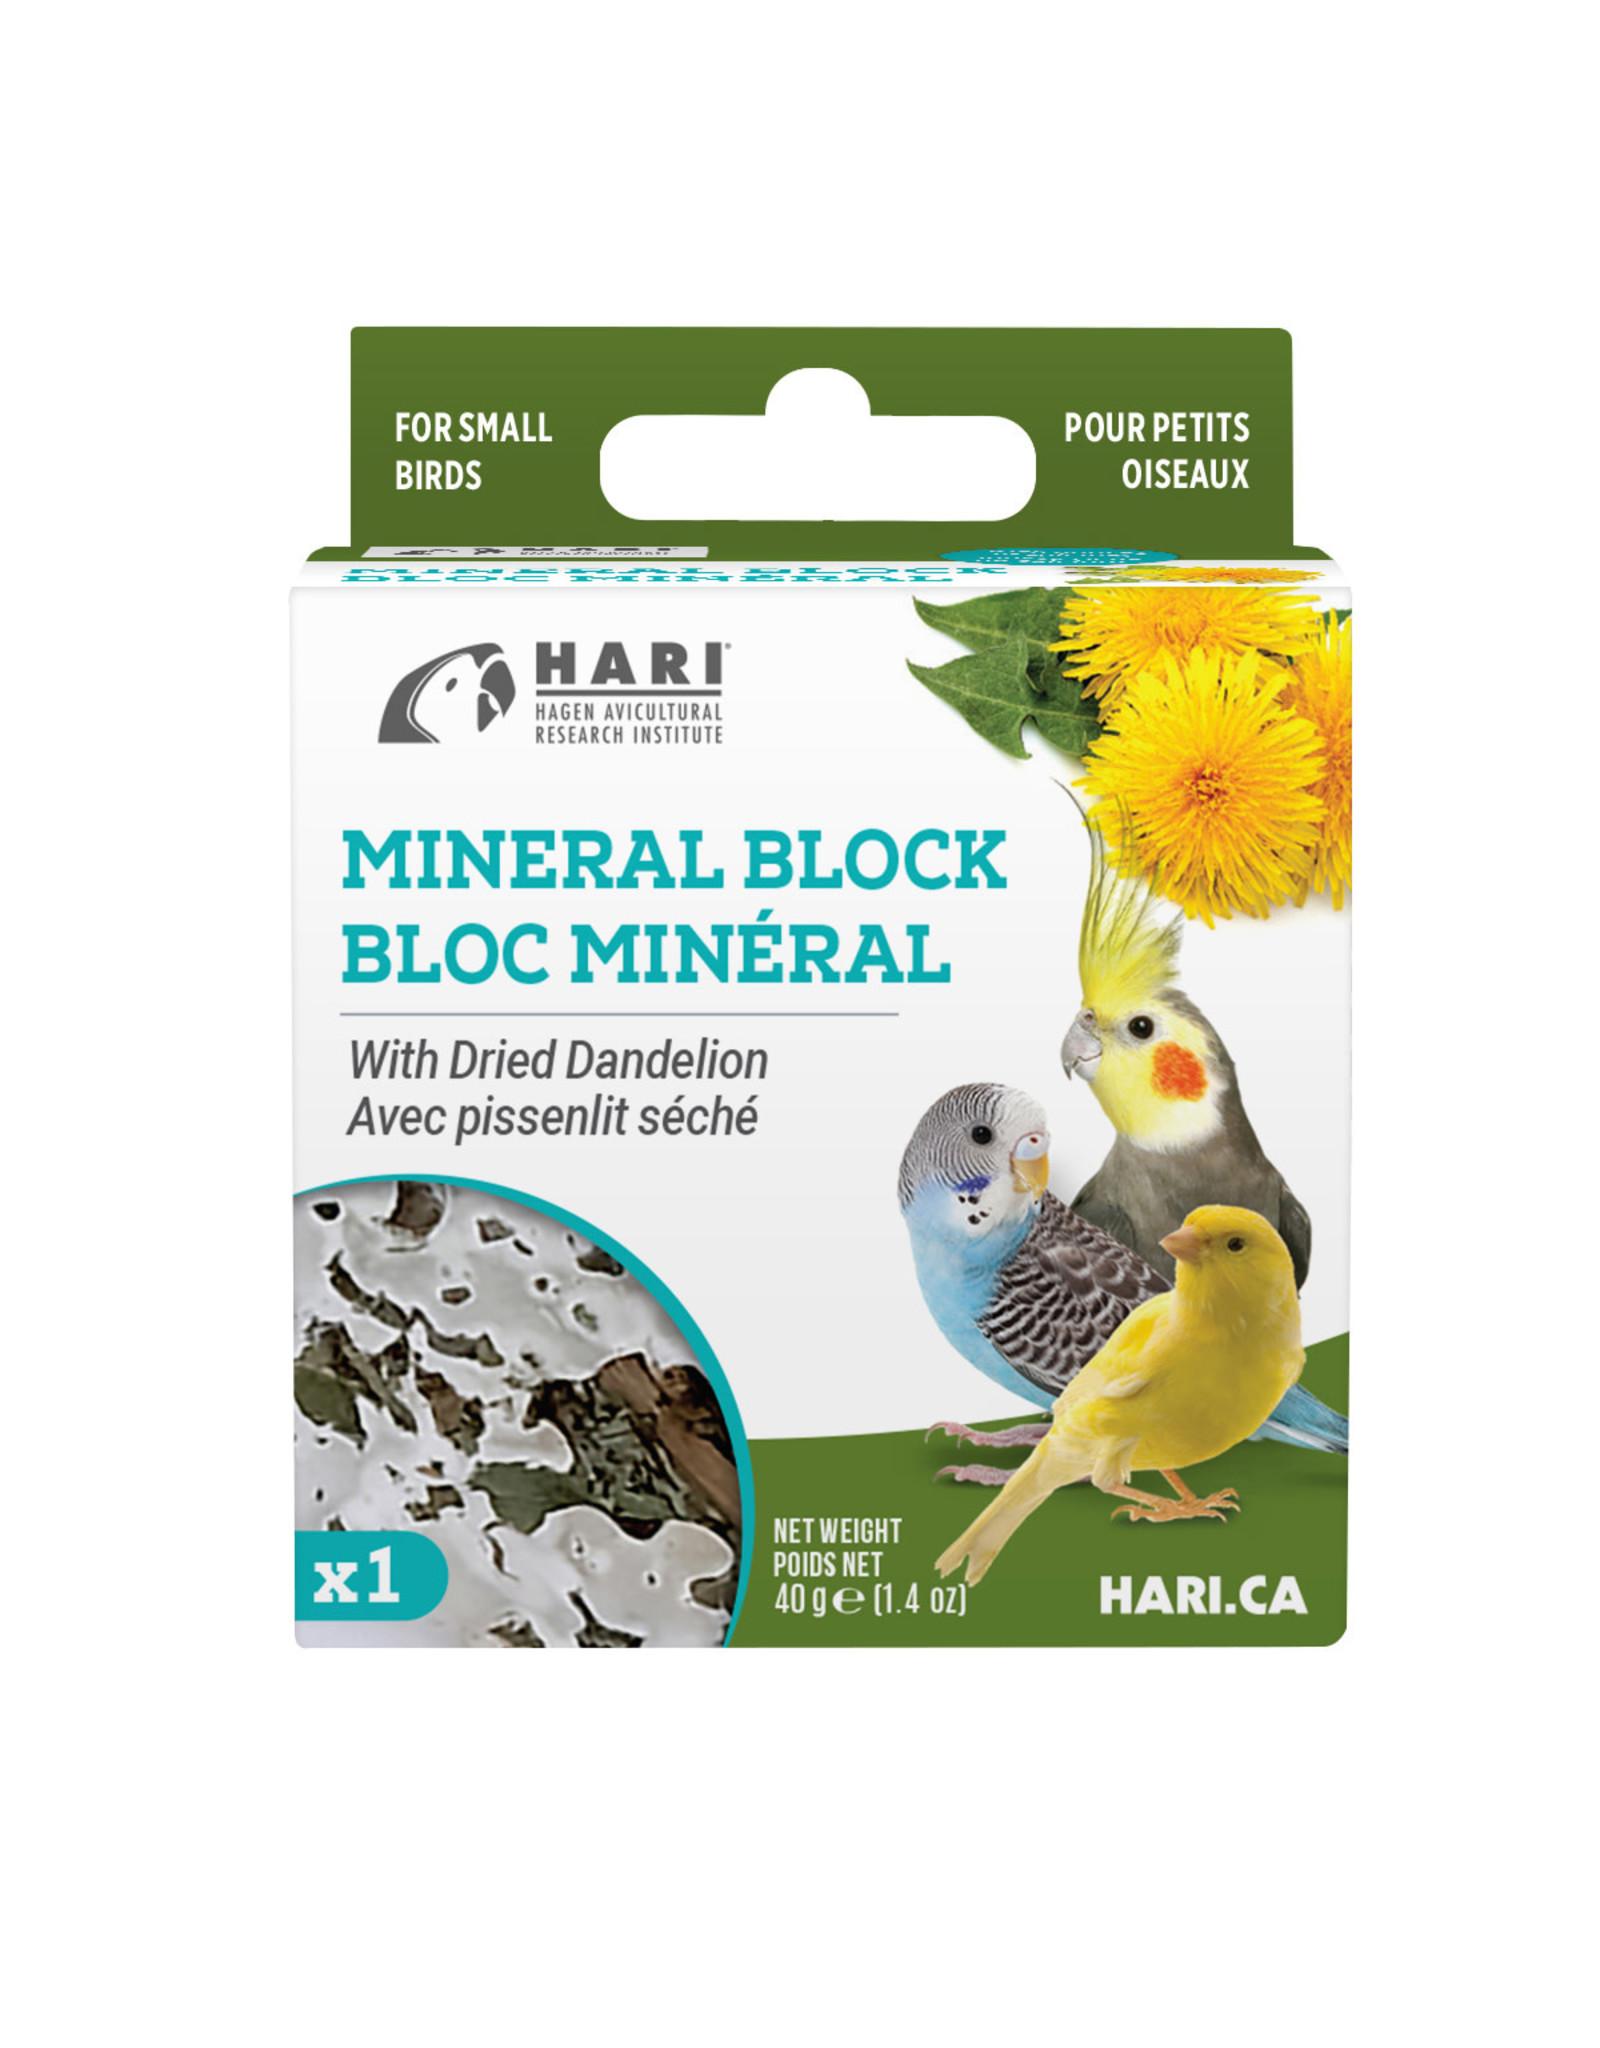 HARI HARI Mineral Block for Small Birds Dried Dandelion 40g 1 pack